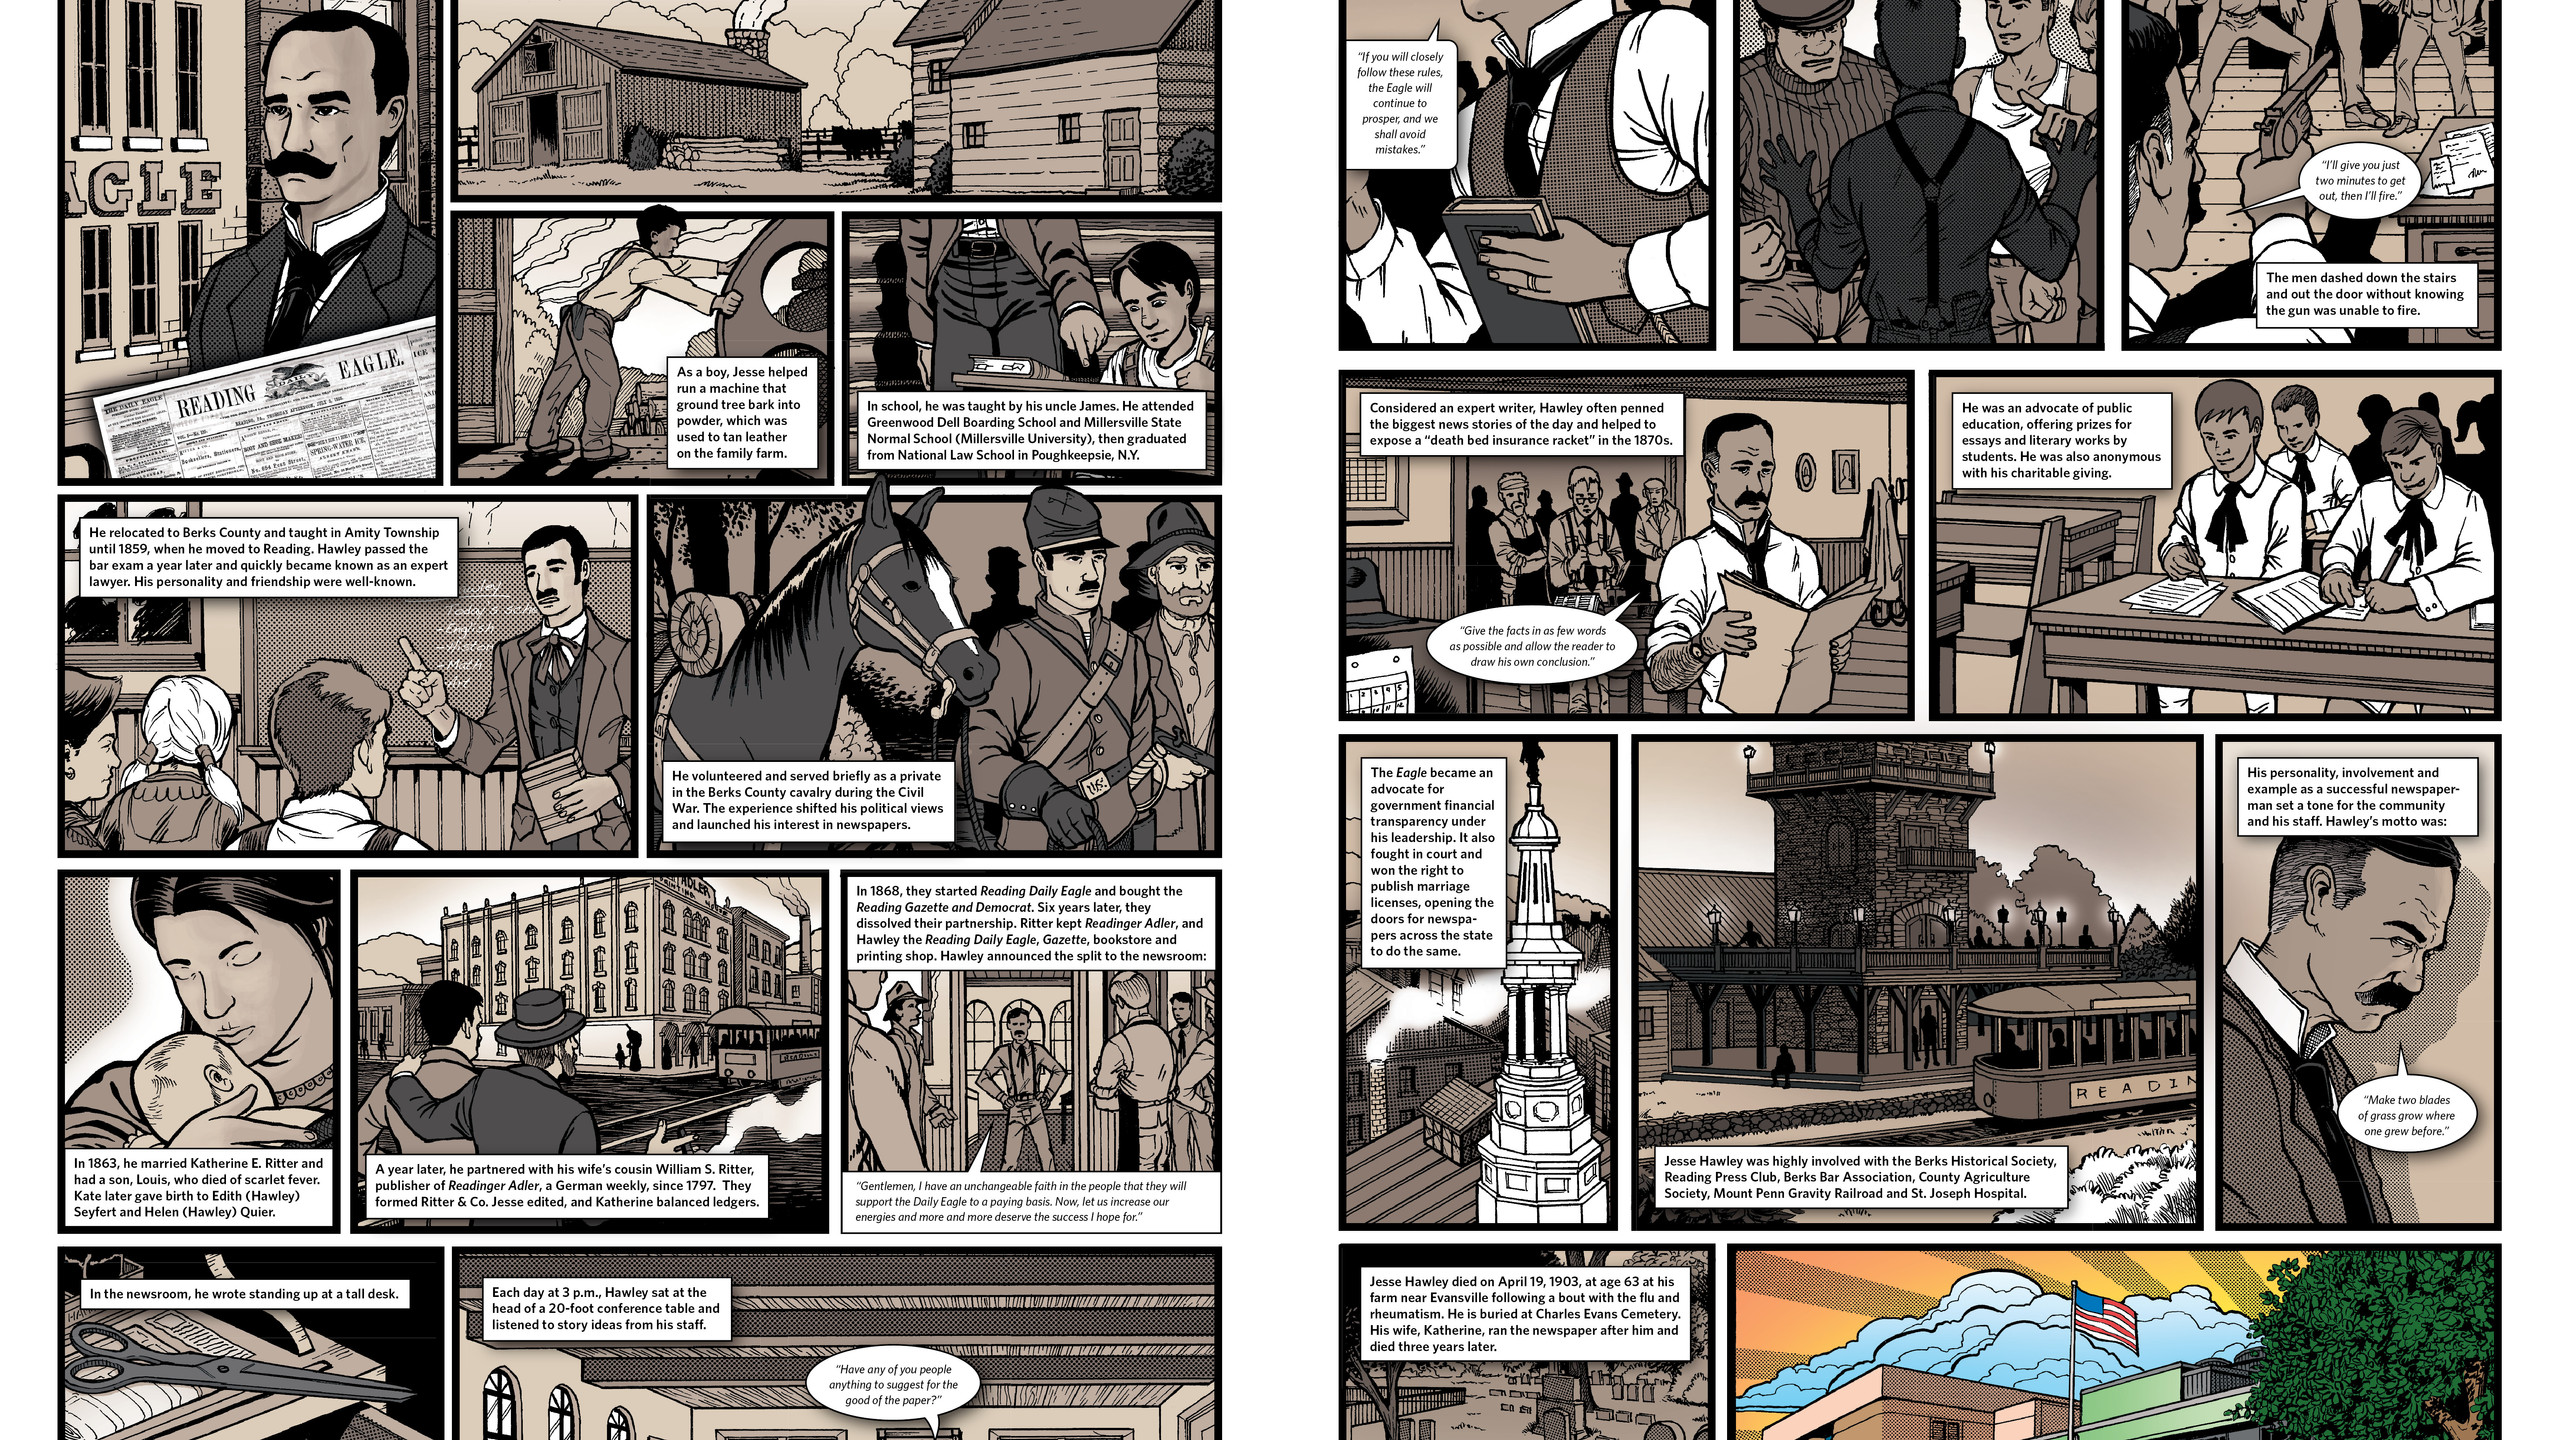 Hawley comic spread